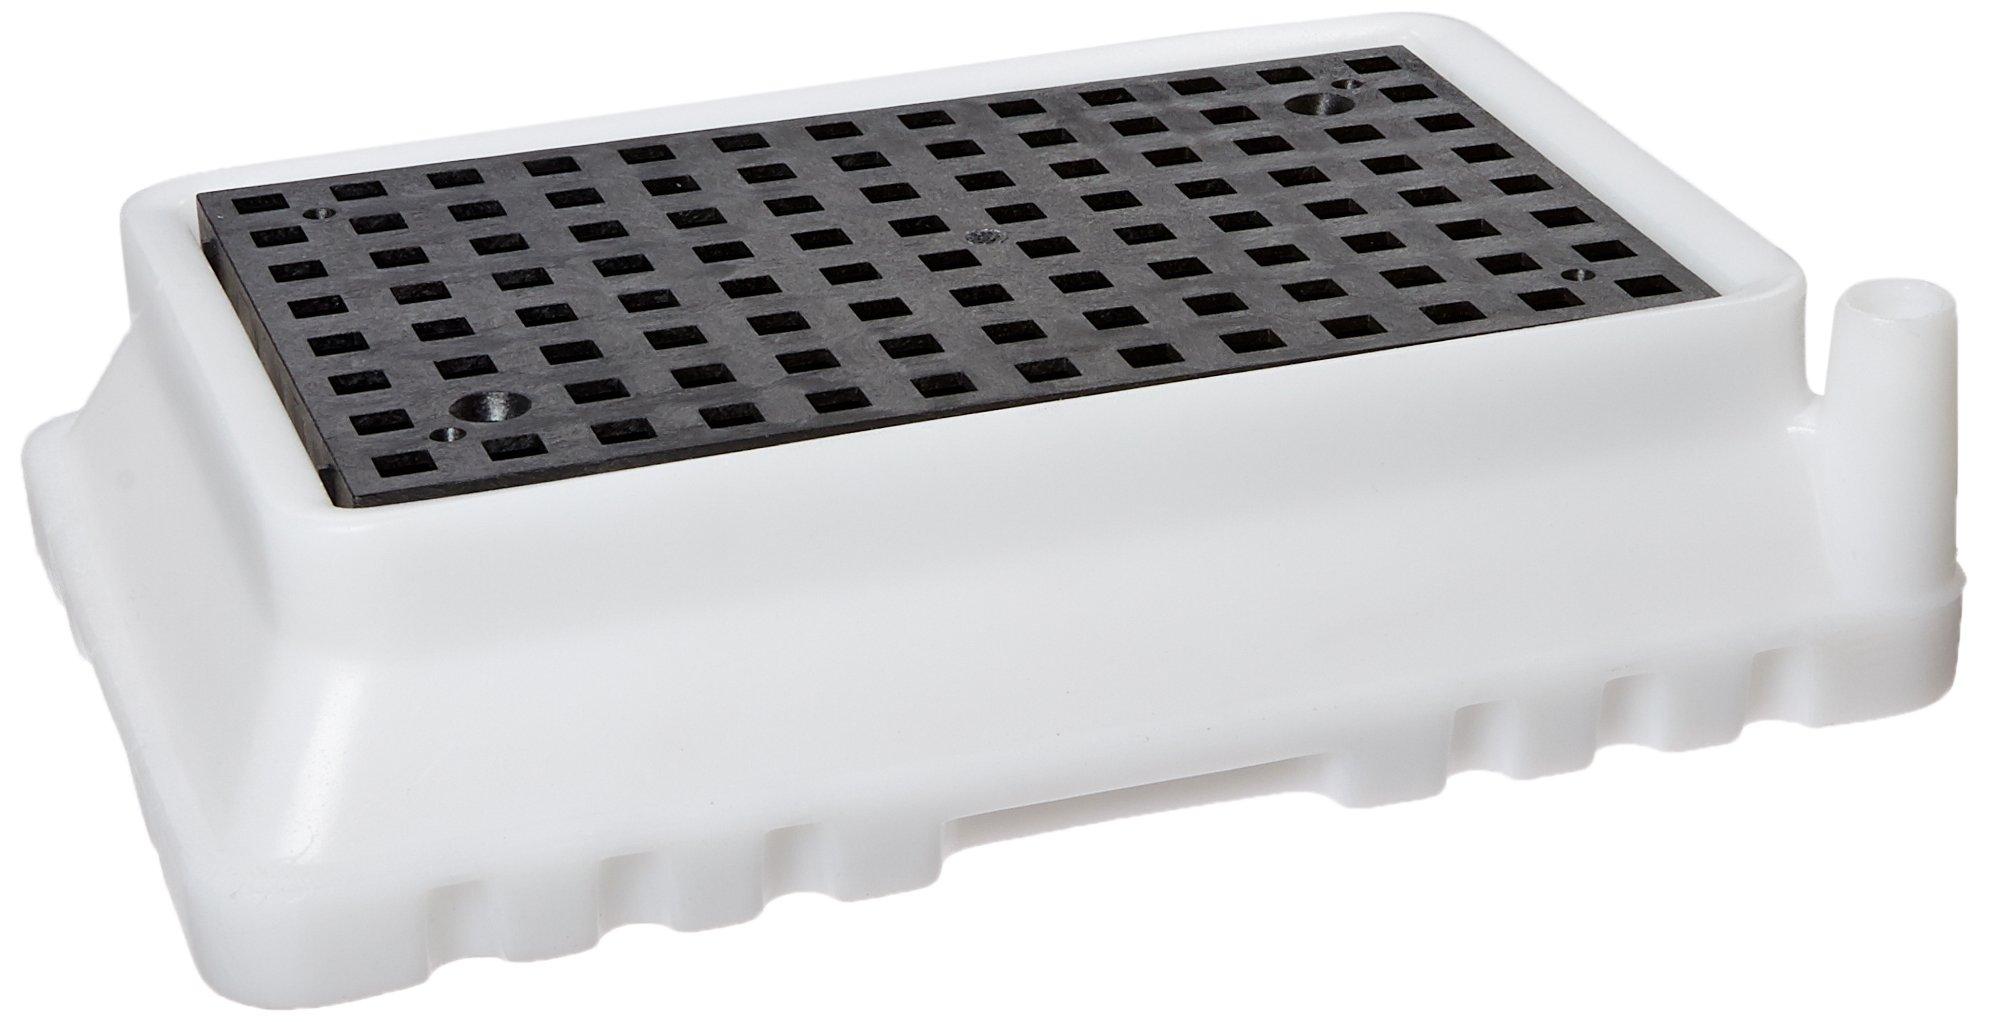 New Pig PAK371 Polyethylene Spill Containment Tray, 1.5 Gallon Sump Capacity, 16-5/8'' Length x 12'' Width x 3.88'' Height, White/Black